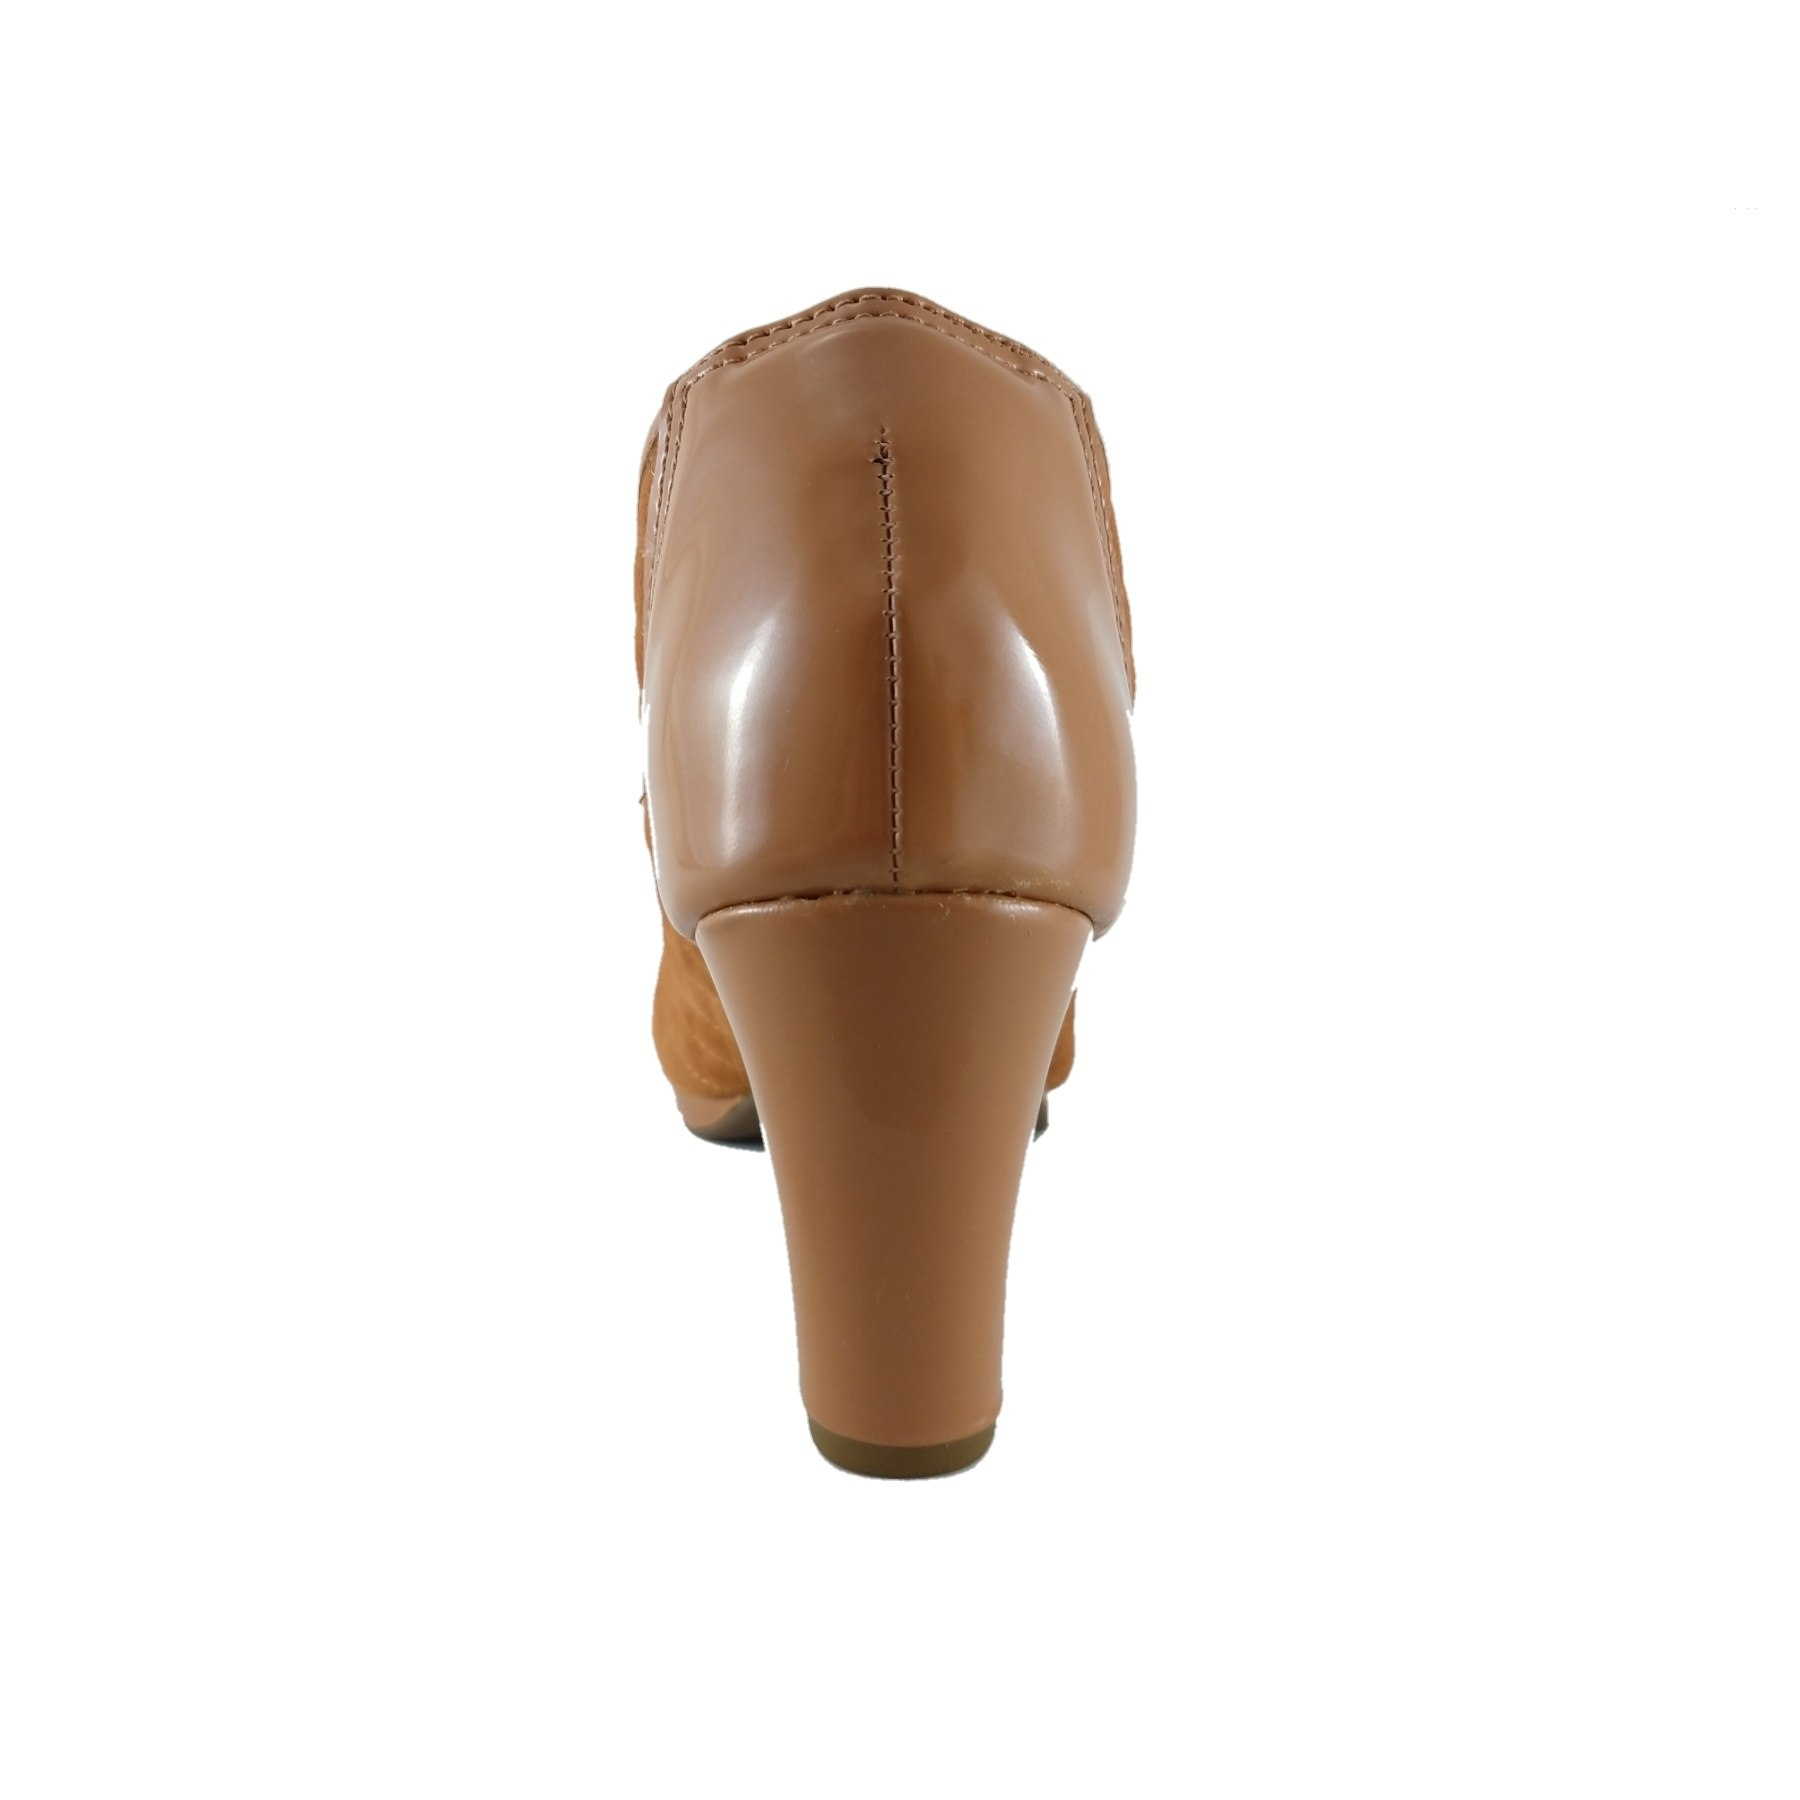 Peep Toe Confort SapatoWeb Matelassê Caramelo  - SAPATOWEB.COM